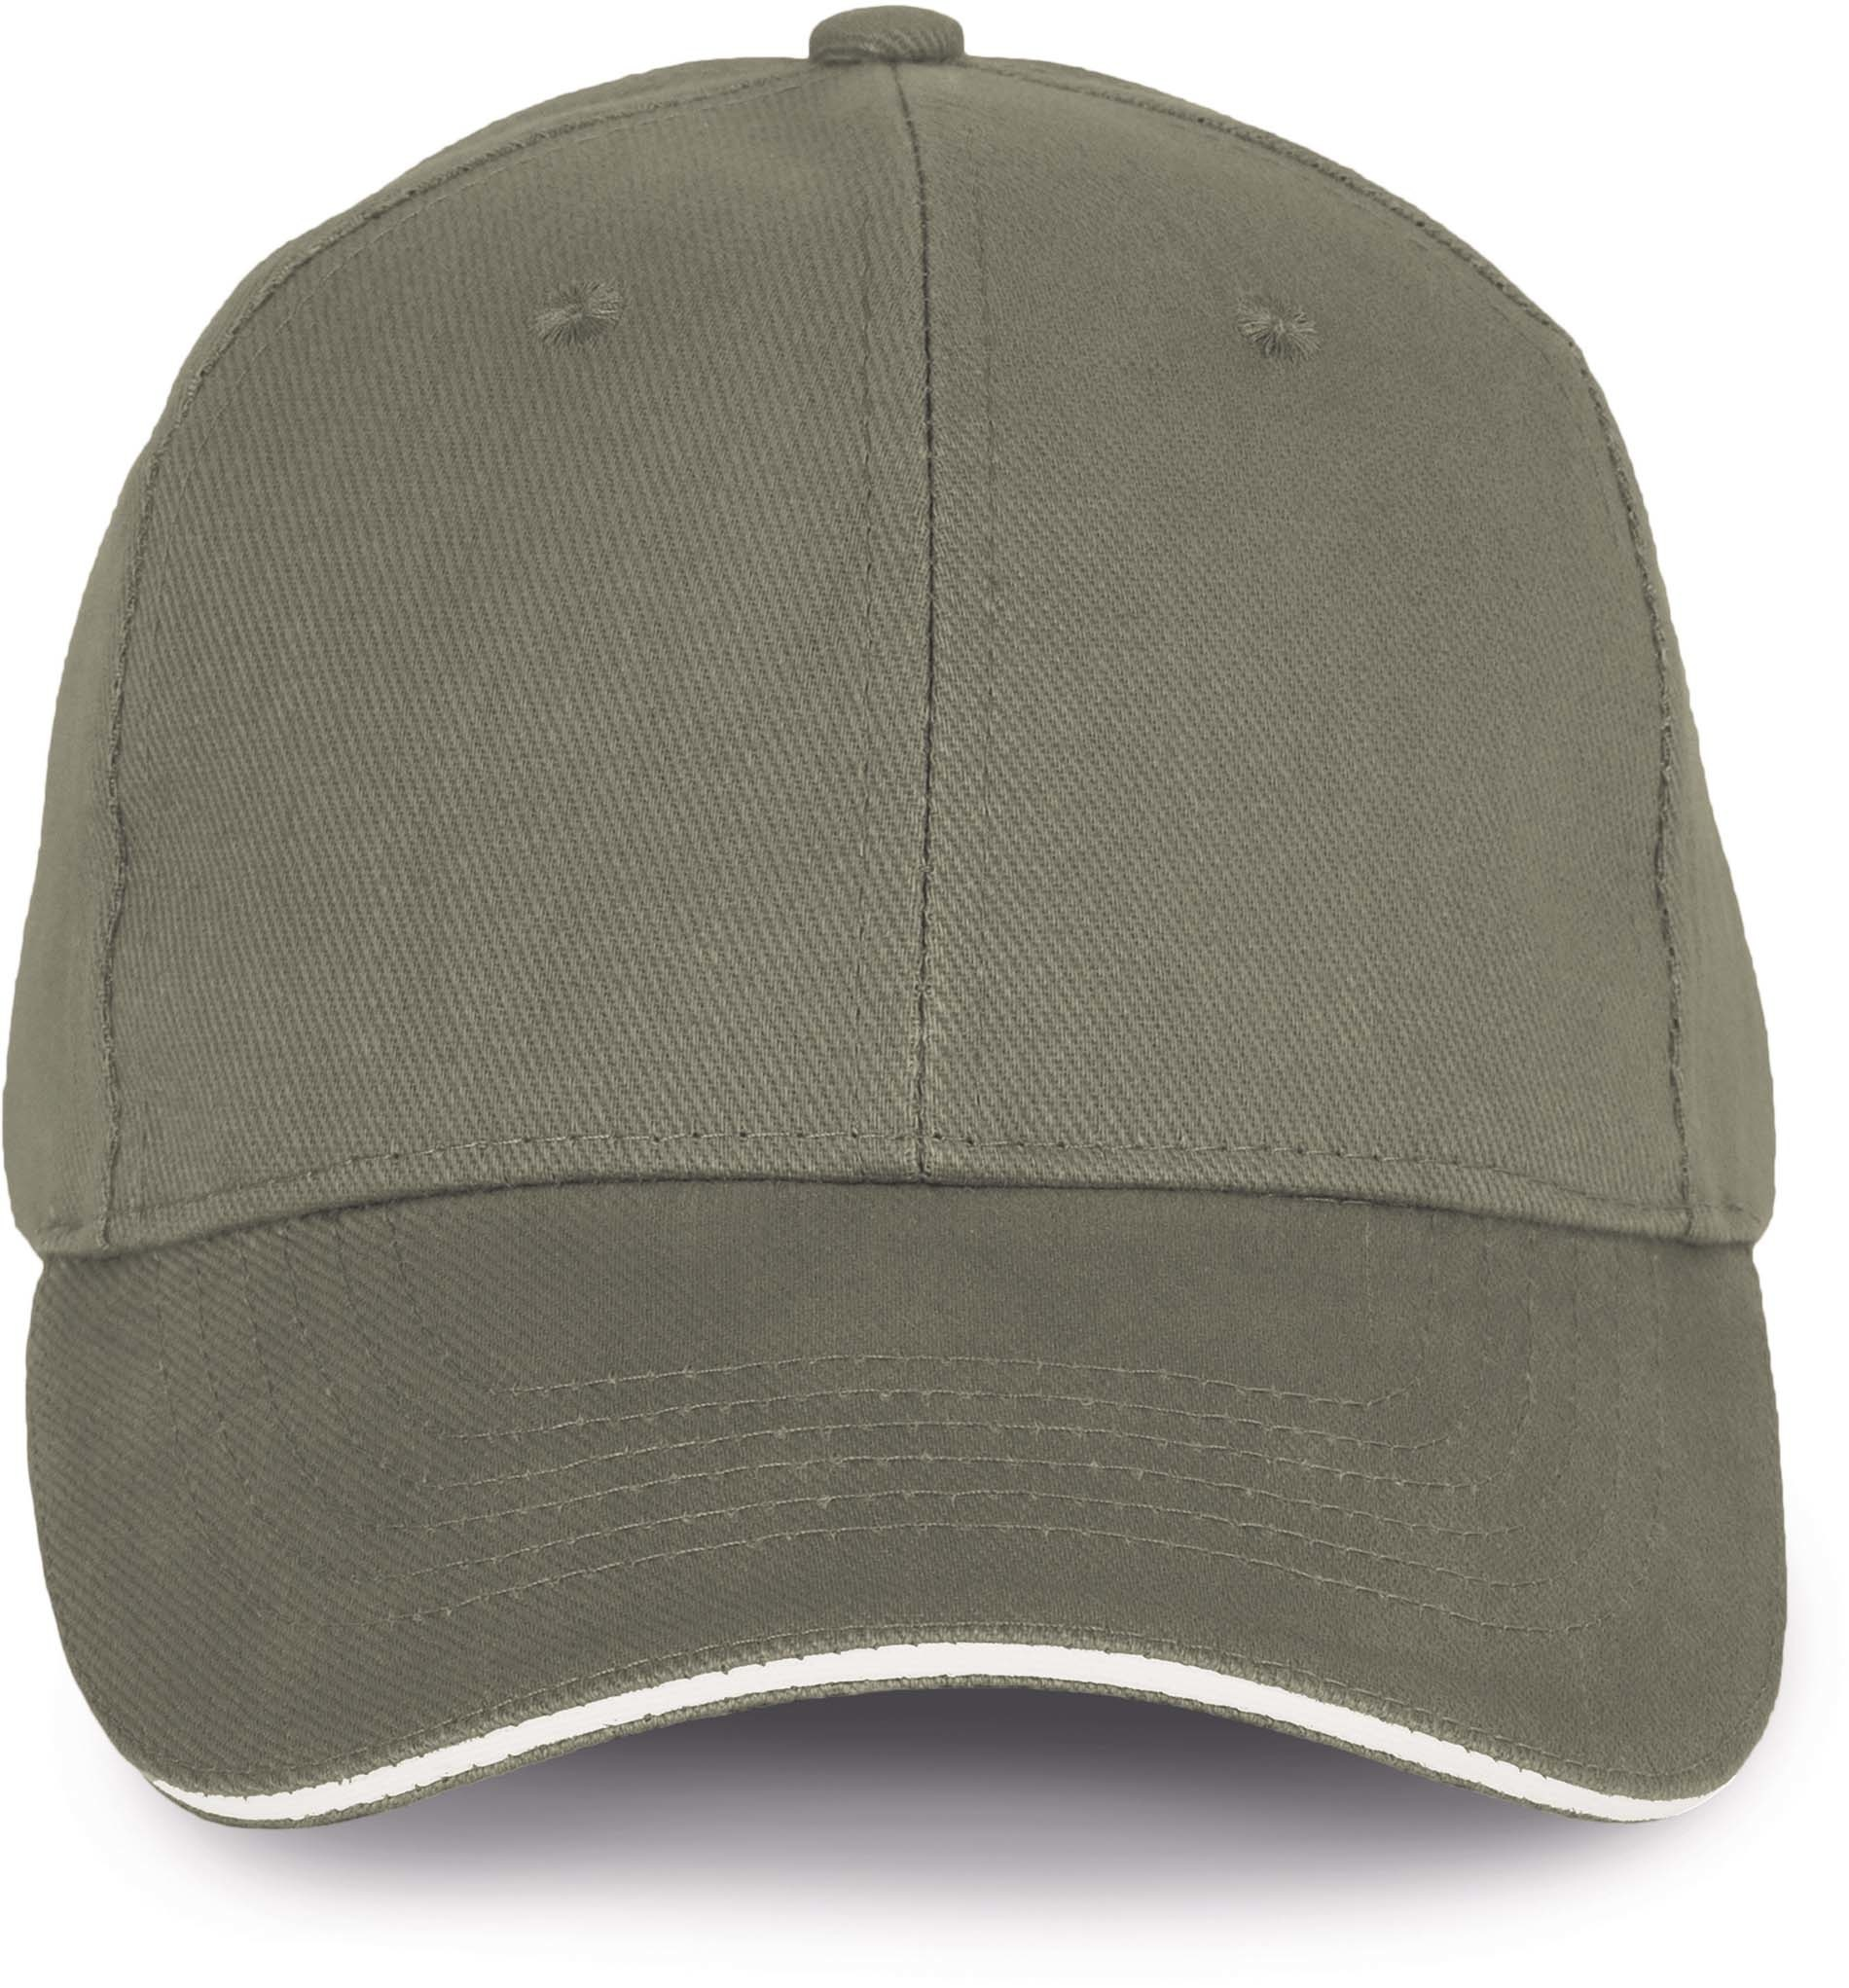 Cap van 100% Biokatoen kleur Almond green-Ivory